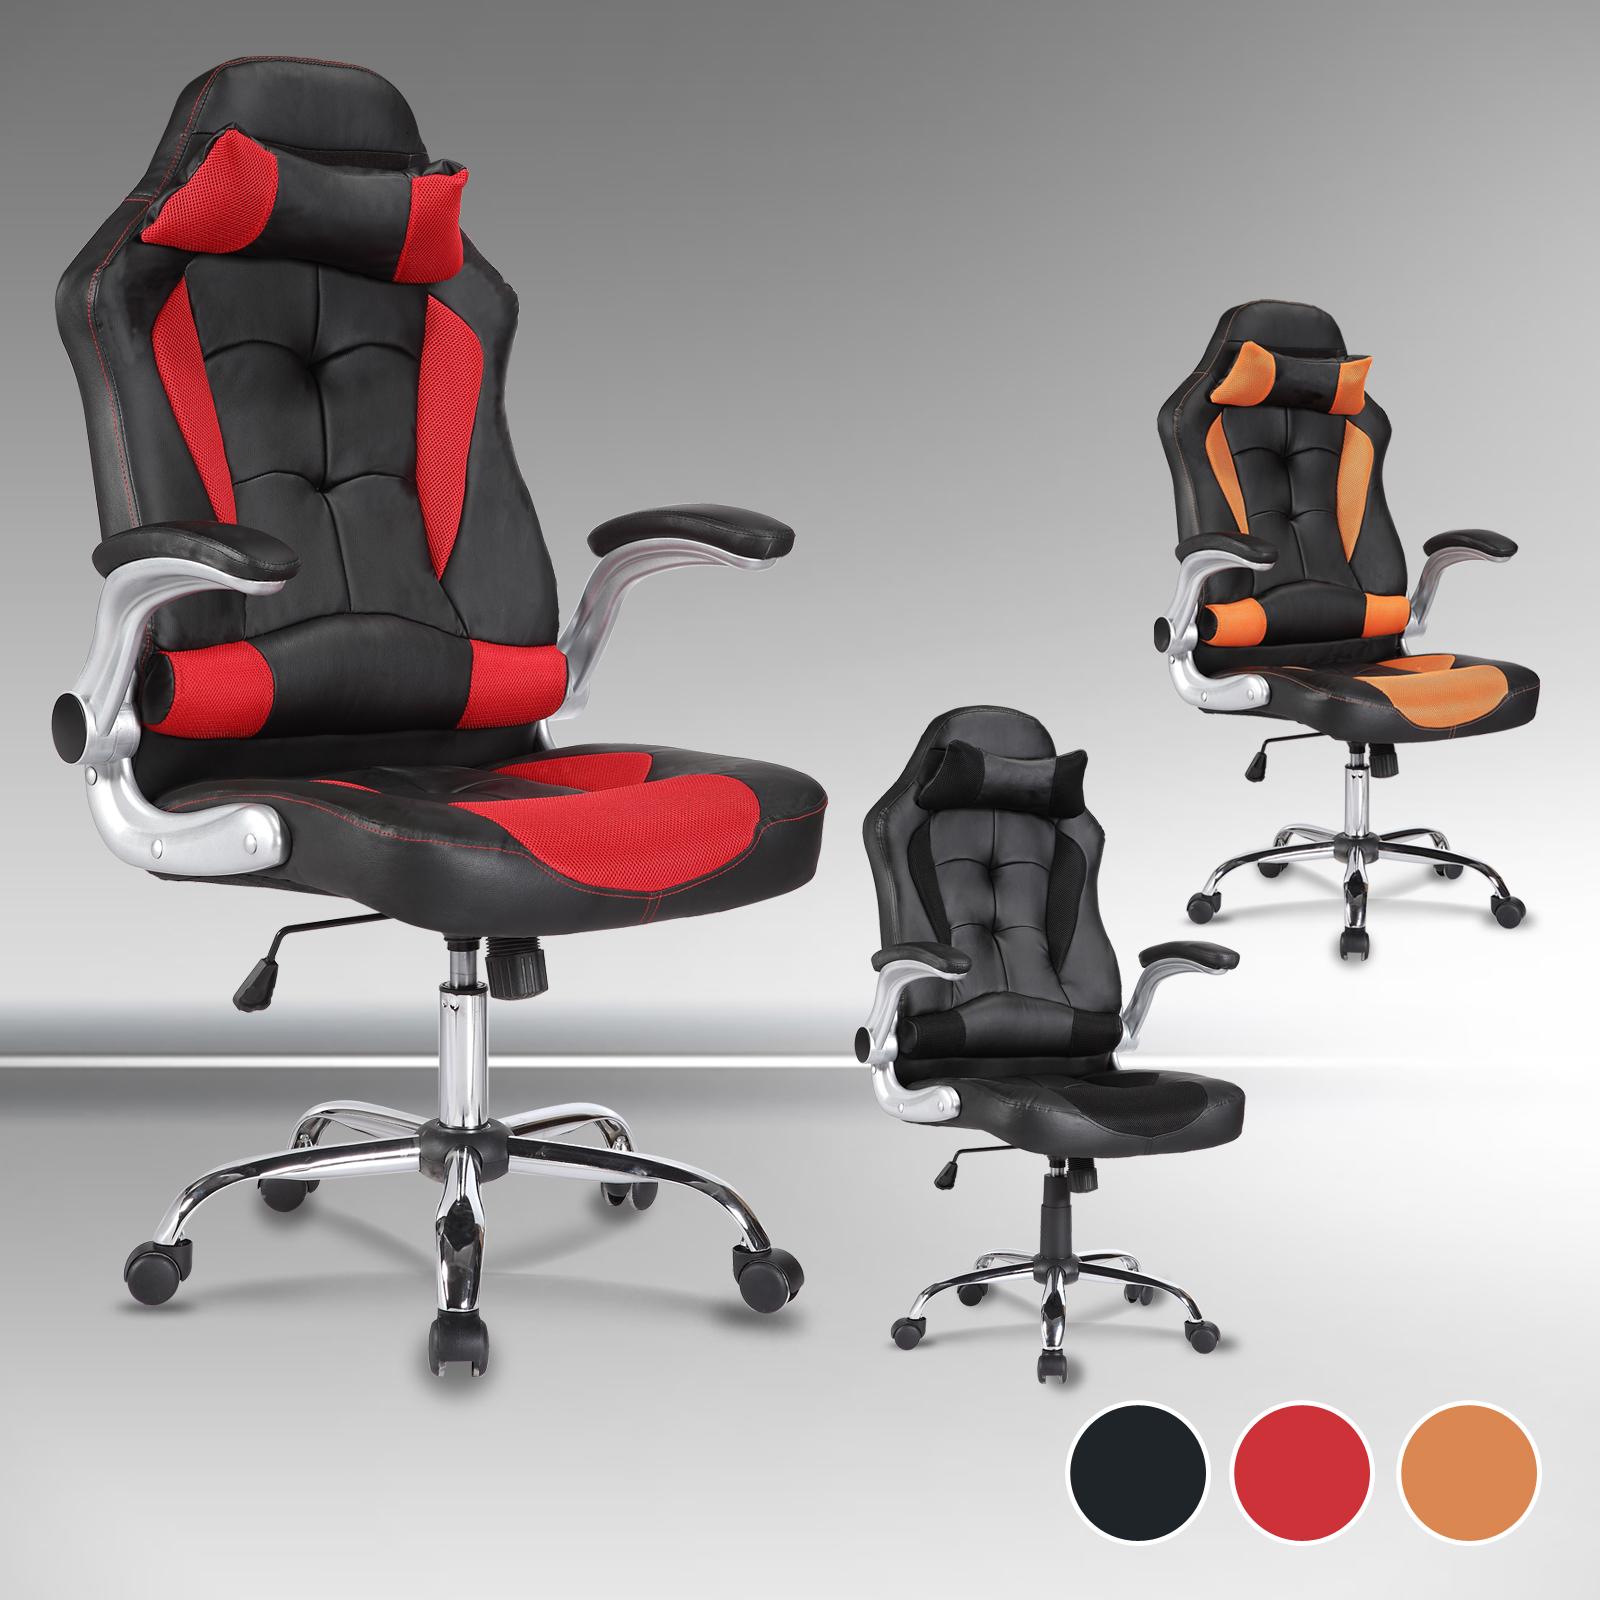 Modern gaming stuhl racing stuh b rostuhl chefsessel drehstuhl computer stuhl ebay - Gaming stuhl ebay ...